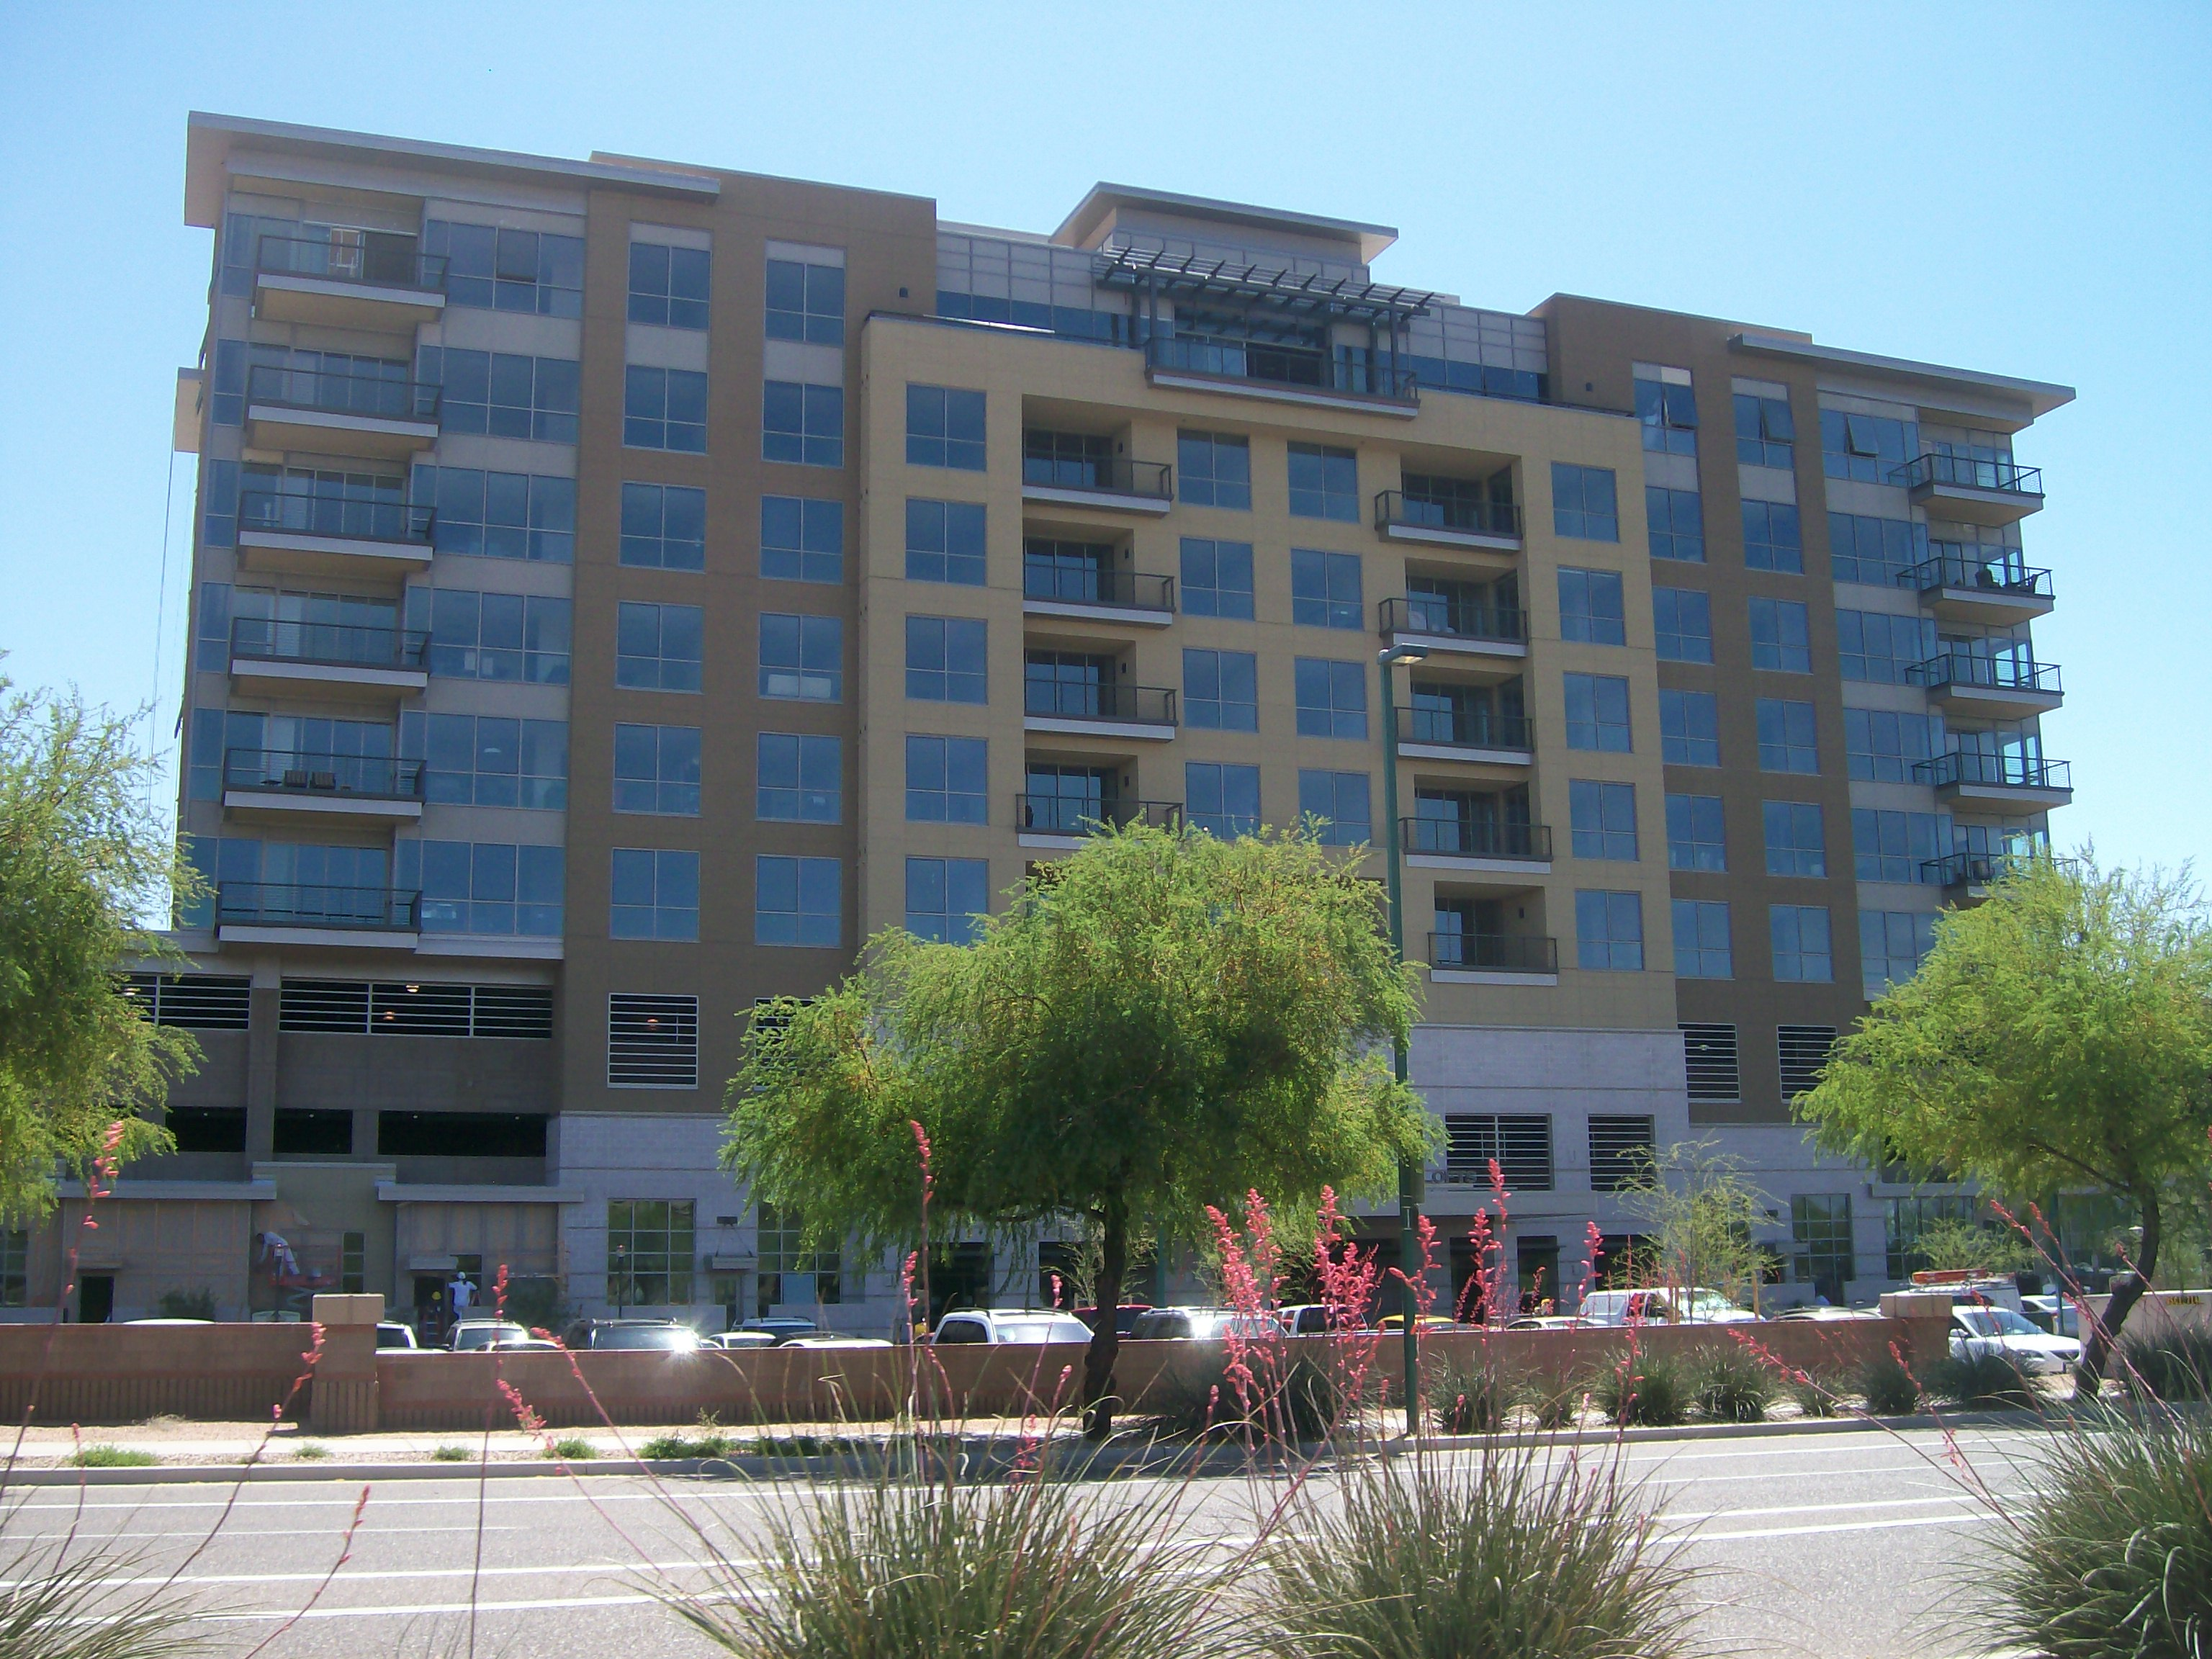 File Kierland Plaza Lofts 2008 04 14 Jpg Wikimedia